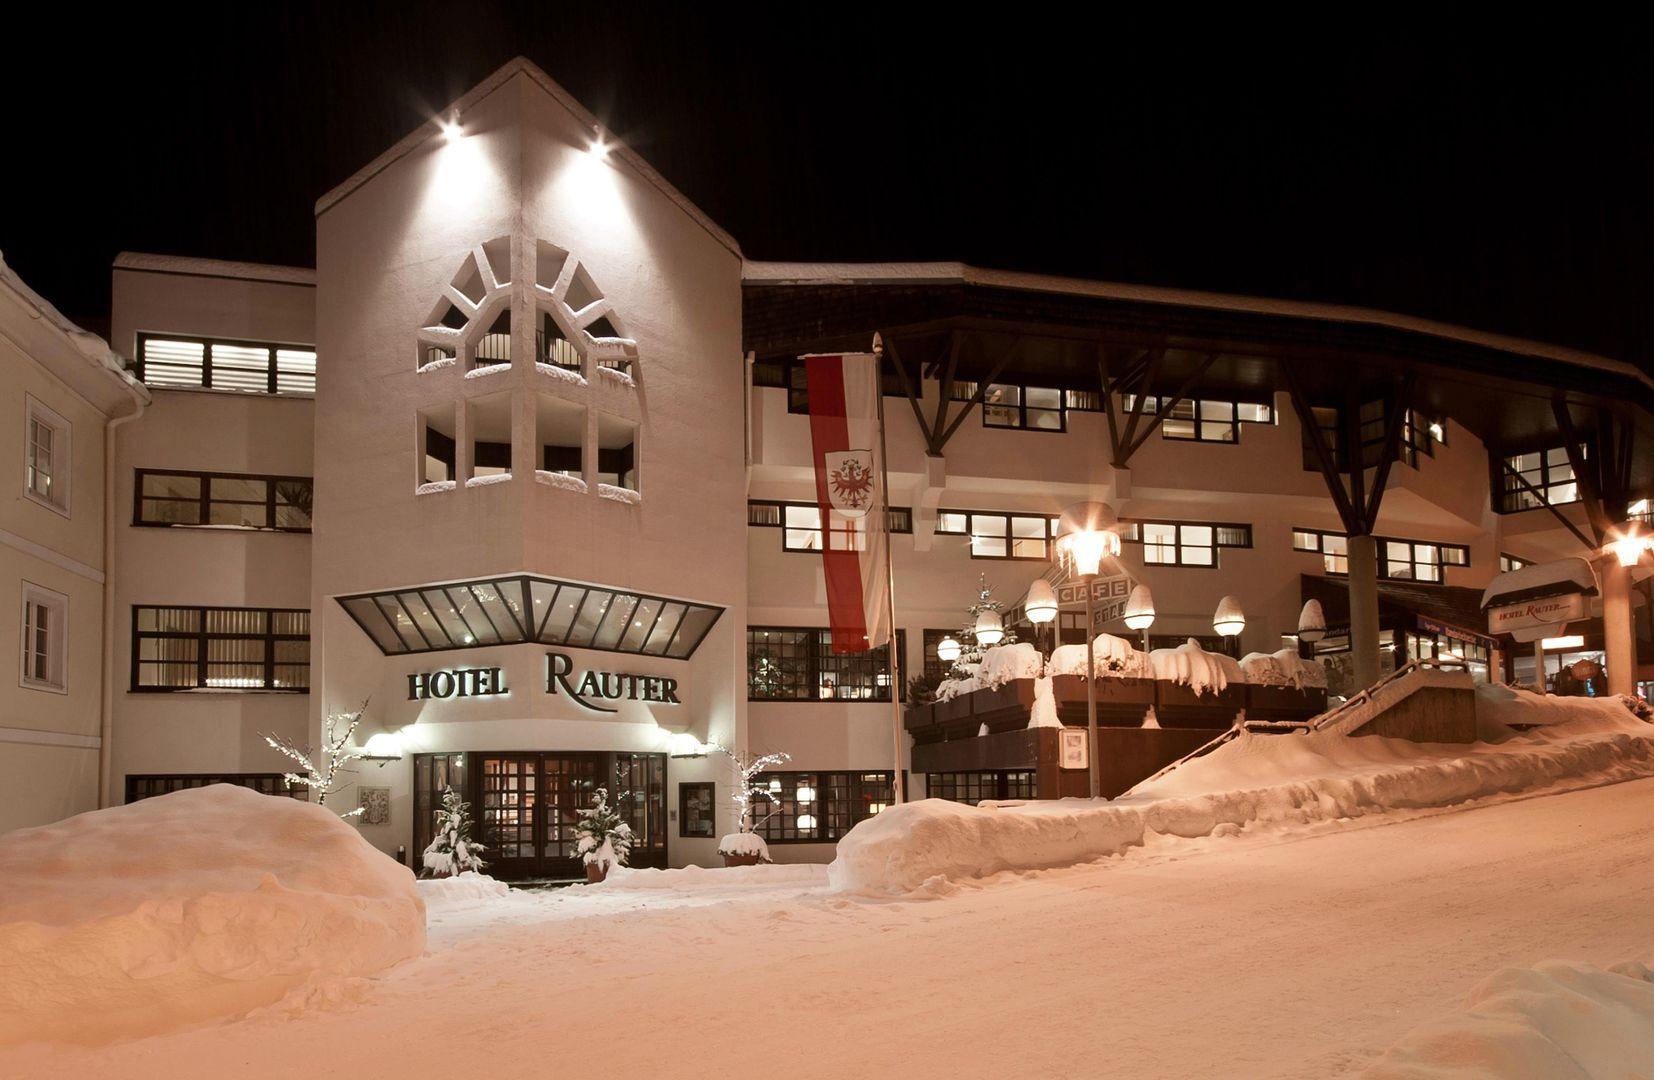 Hotel Rauter - Slide 1